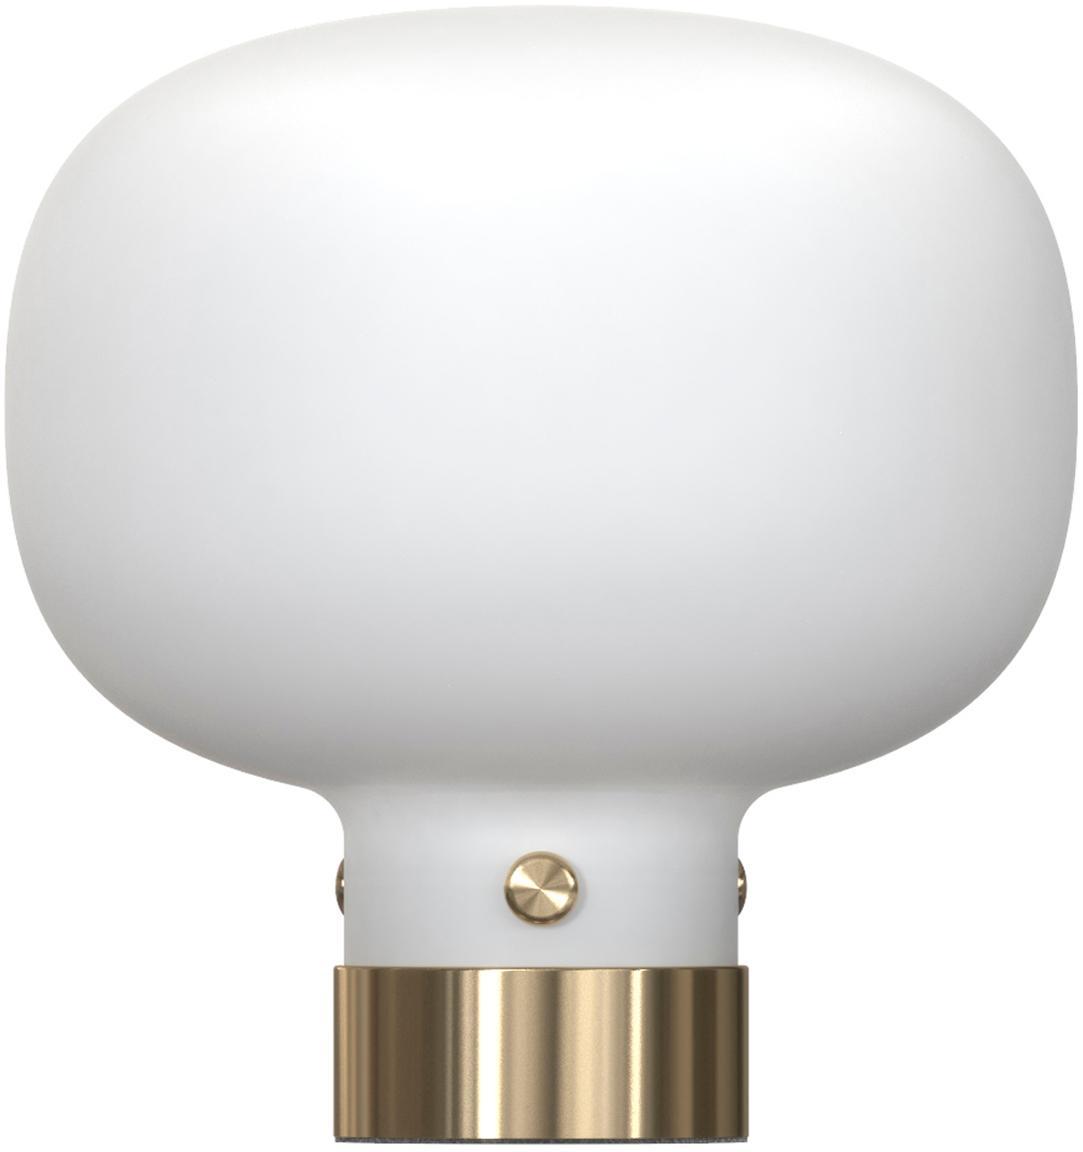 Tafellamp Raito, Opaalglas, metaal, Opaalwit, messingkleurig, Ø 20 x H 21 cm